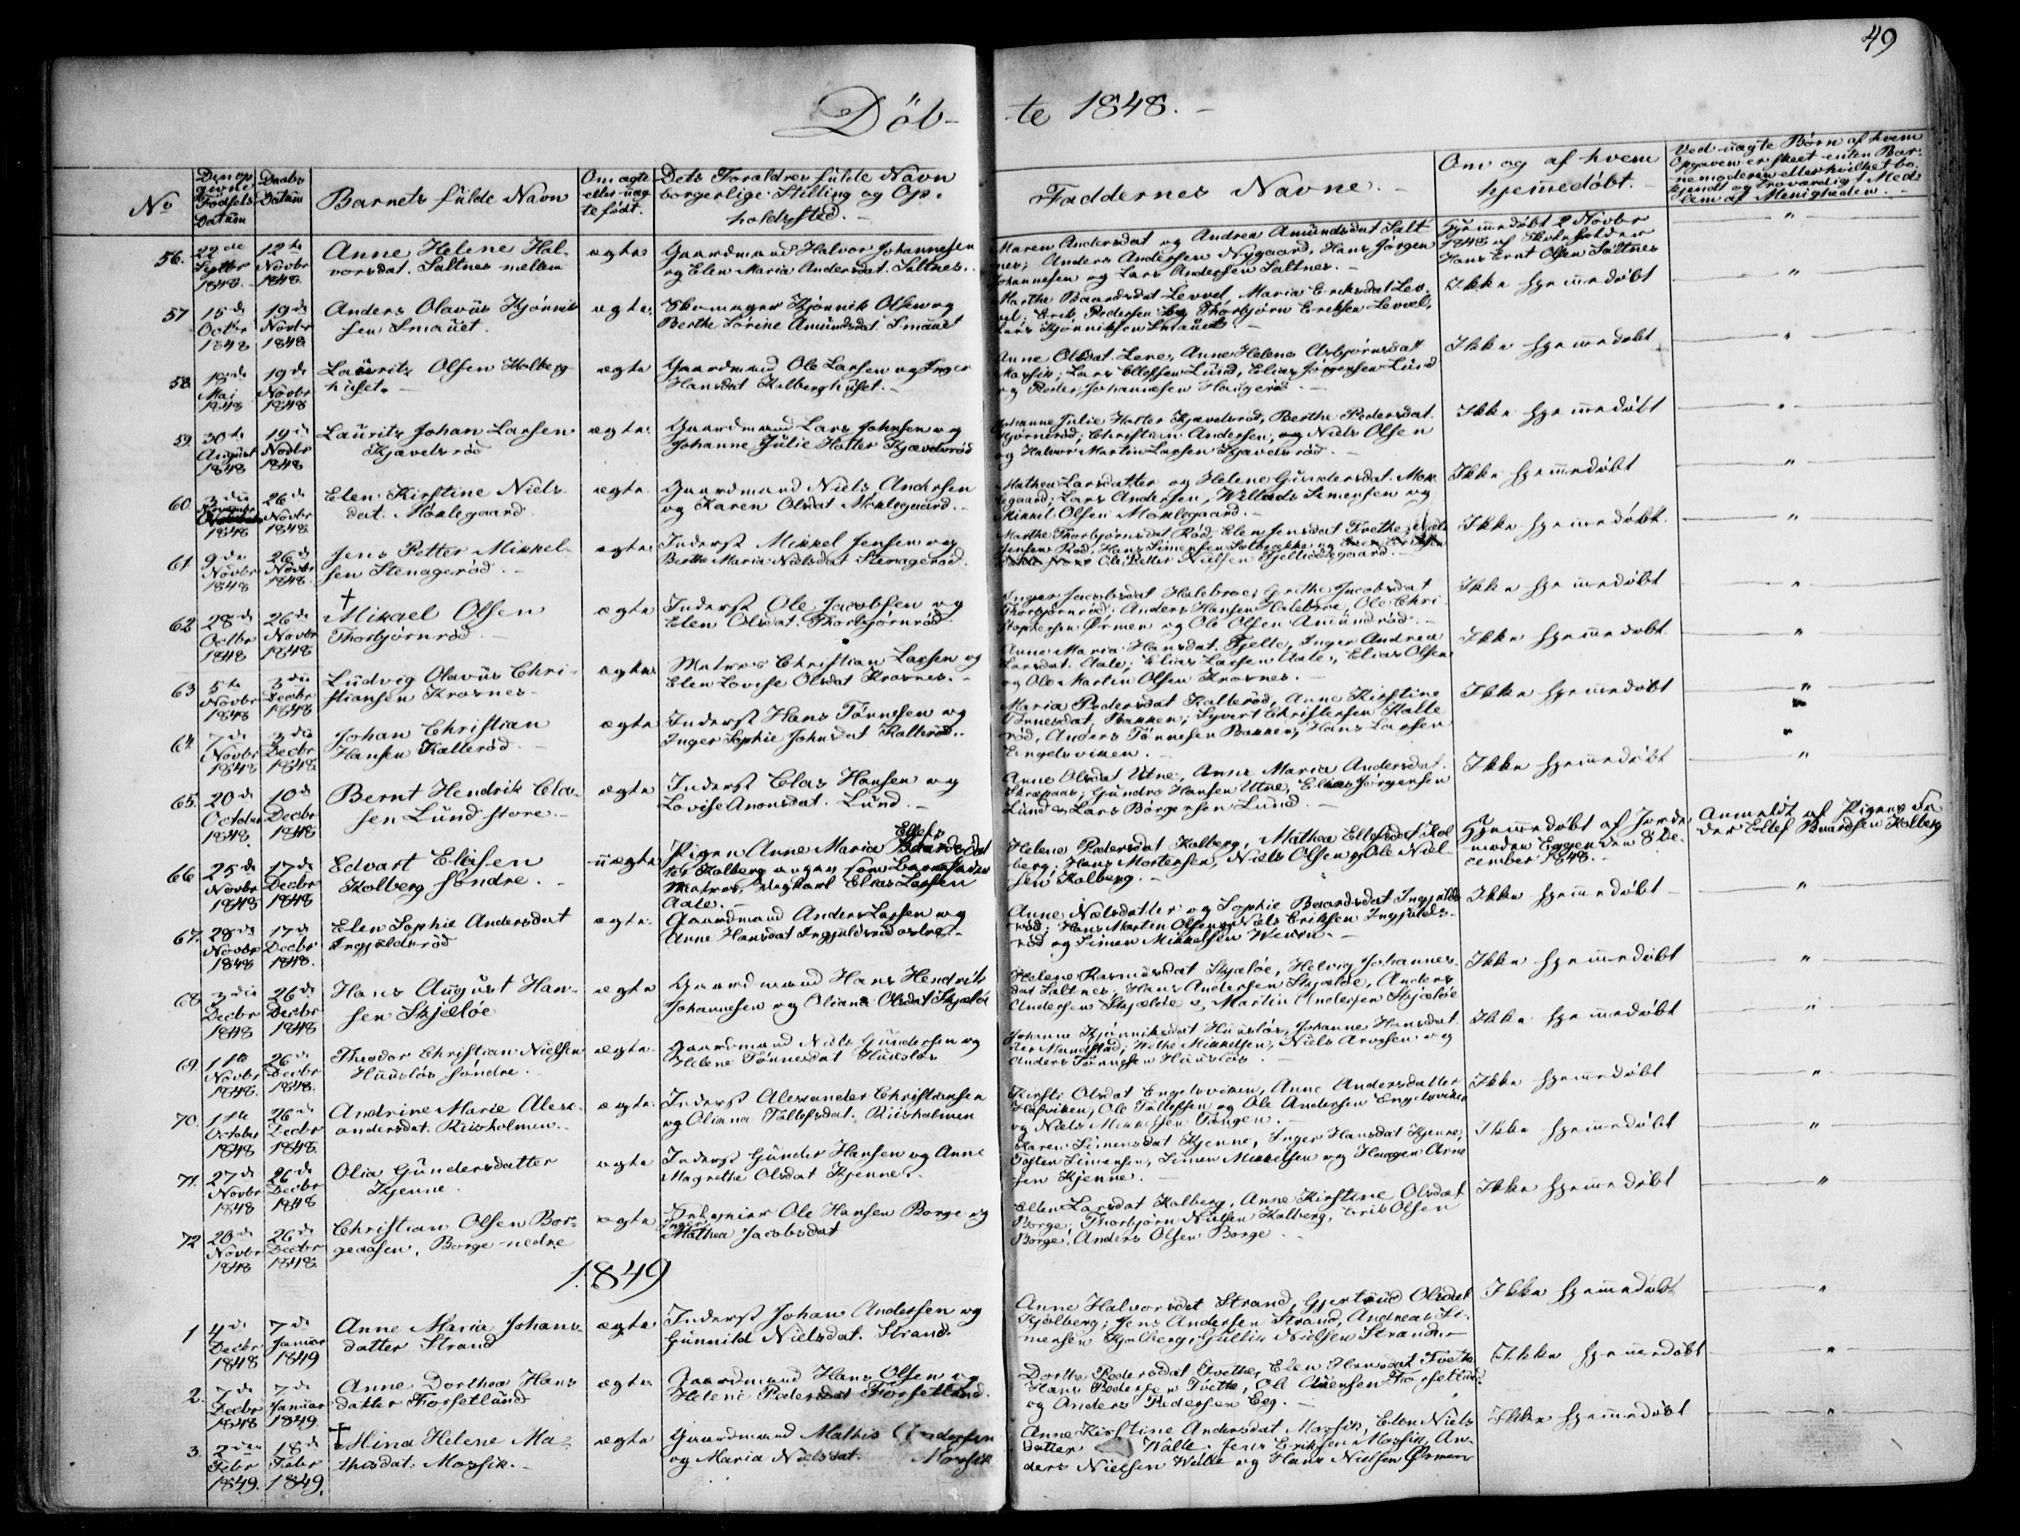 SAO, Onsøy prestekontor Kirkebøker, F/Fa/L0003: Ministerialbok nr. I 3, 1841-1860, s. 49